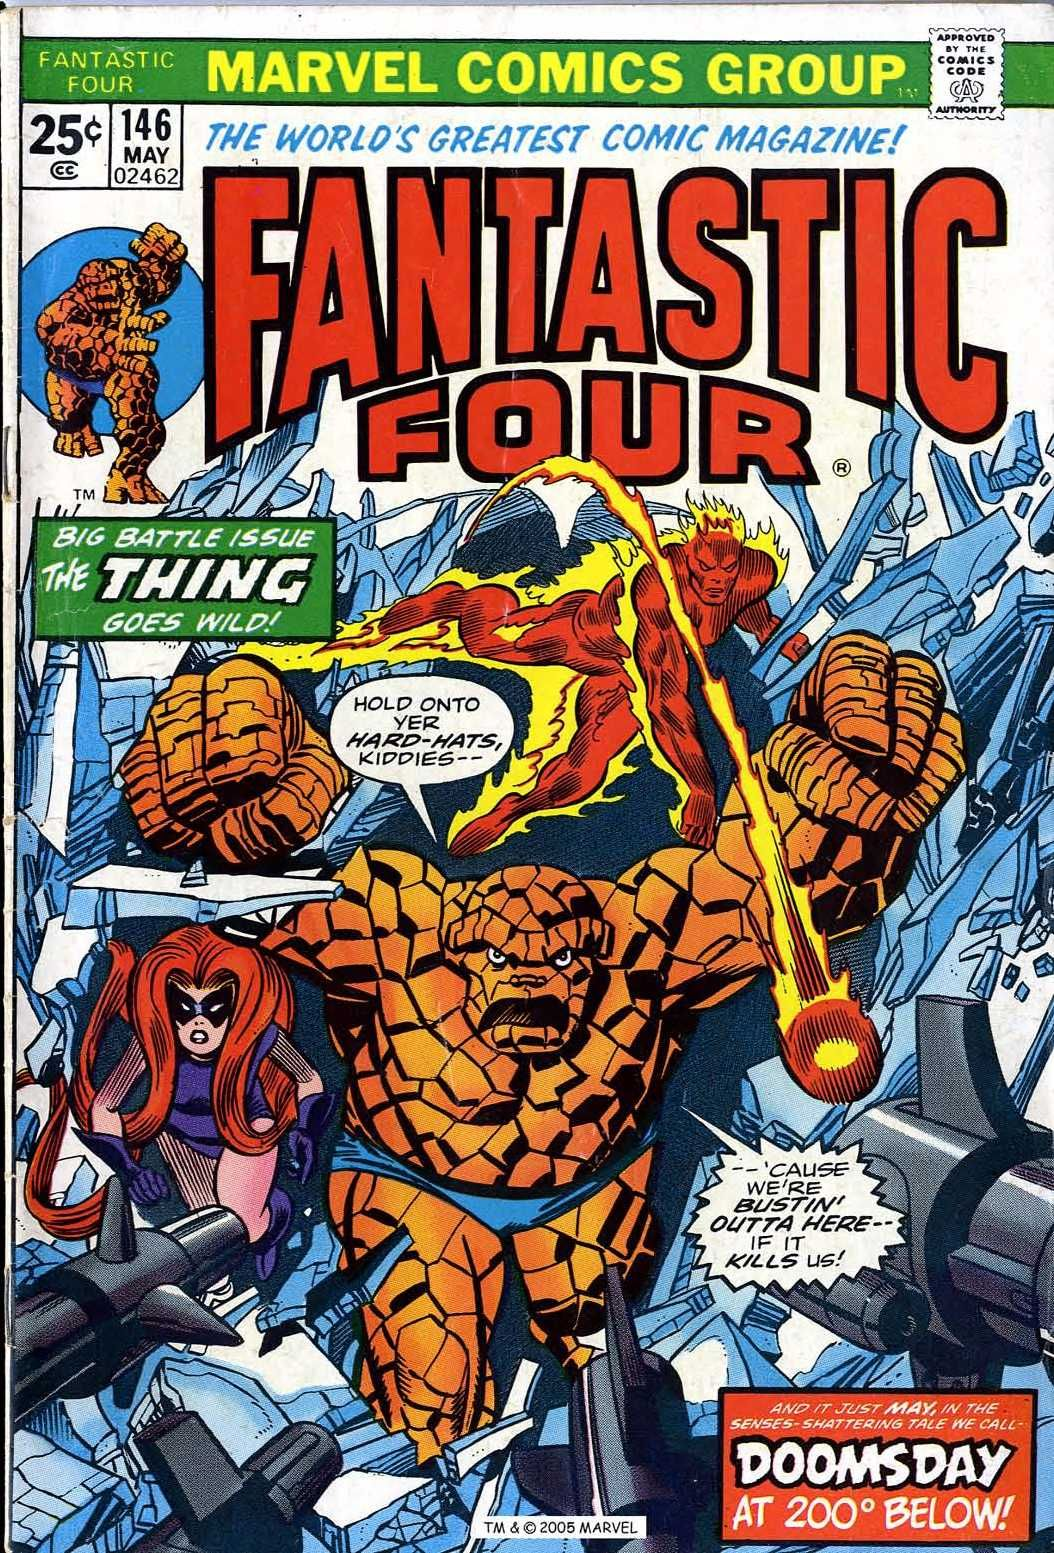 fantastic four  cover by gil kane  gil kane marvel comic book  - marvel comic books · fantastic four  cover by gil kane